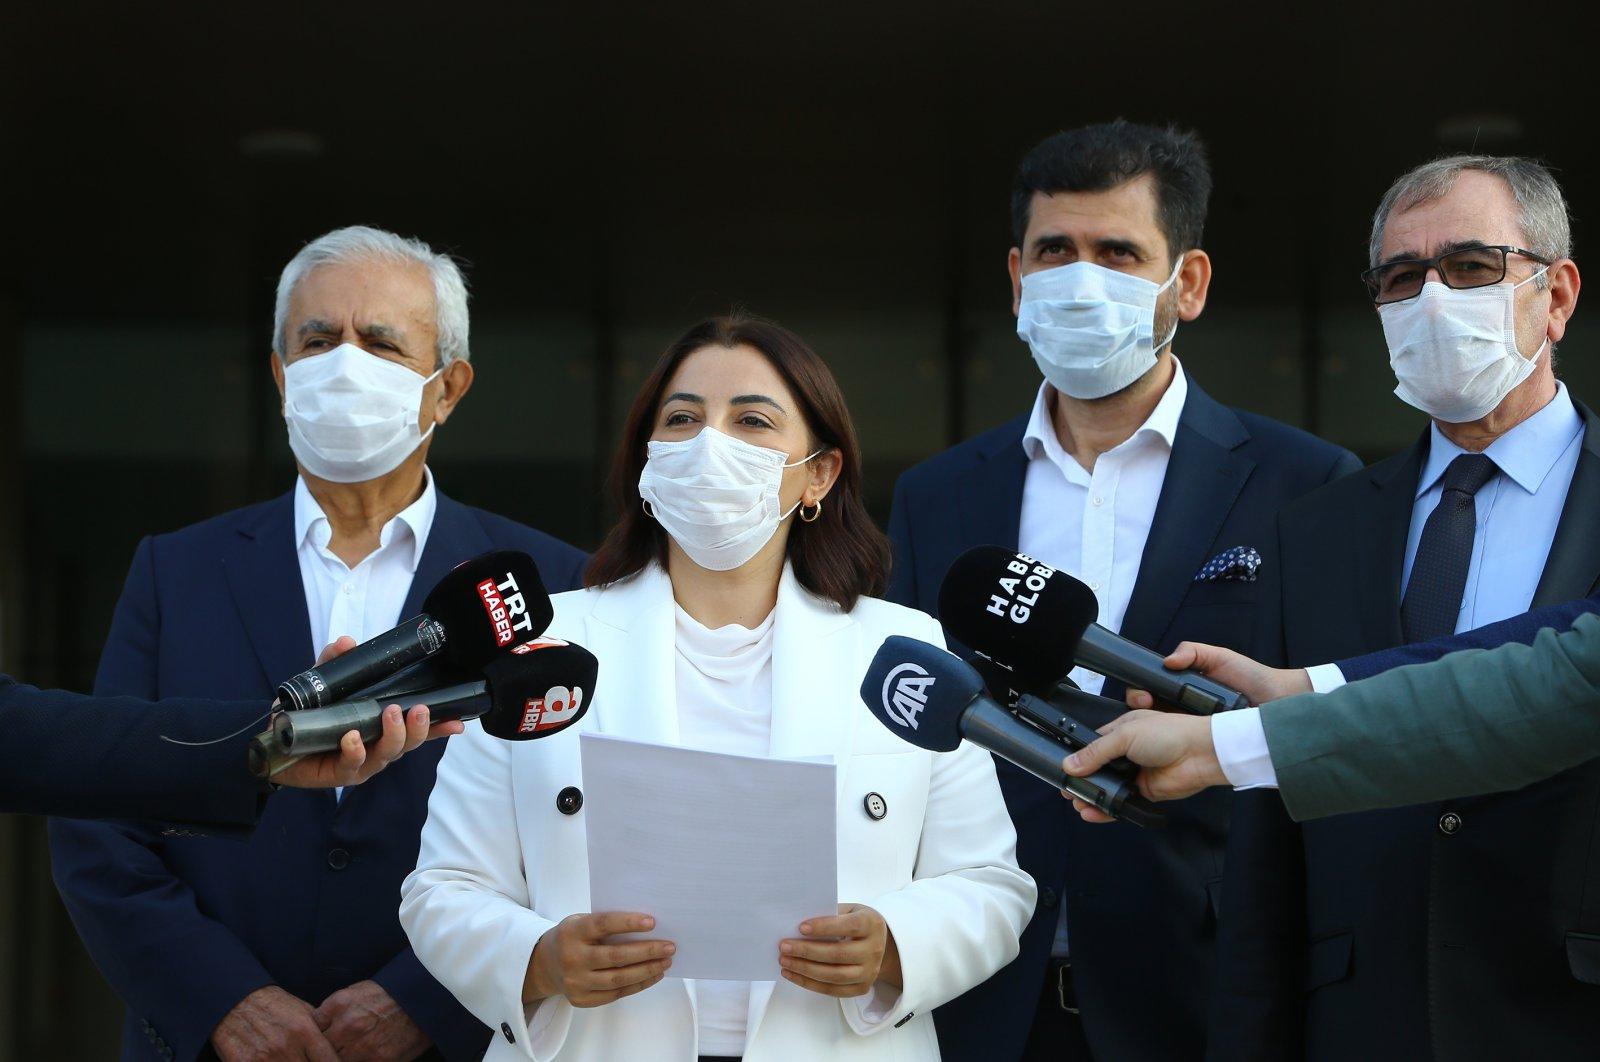 Lawyers (from L to R) Necati Ceylan, Şengül Karslı, Niyazi Paksoy and Cavit Tatlı speak at a press conference in front of the Union of Turkish Bar Associations' (TBB) headquarters in Ankara, Sept. 25, 2020. (AA Photo)